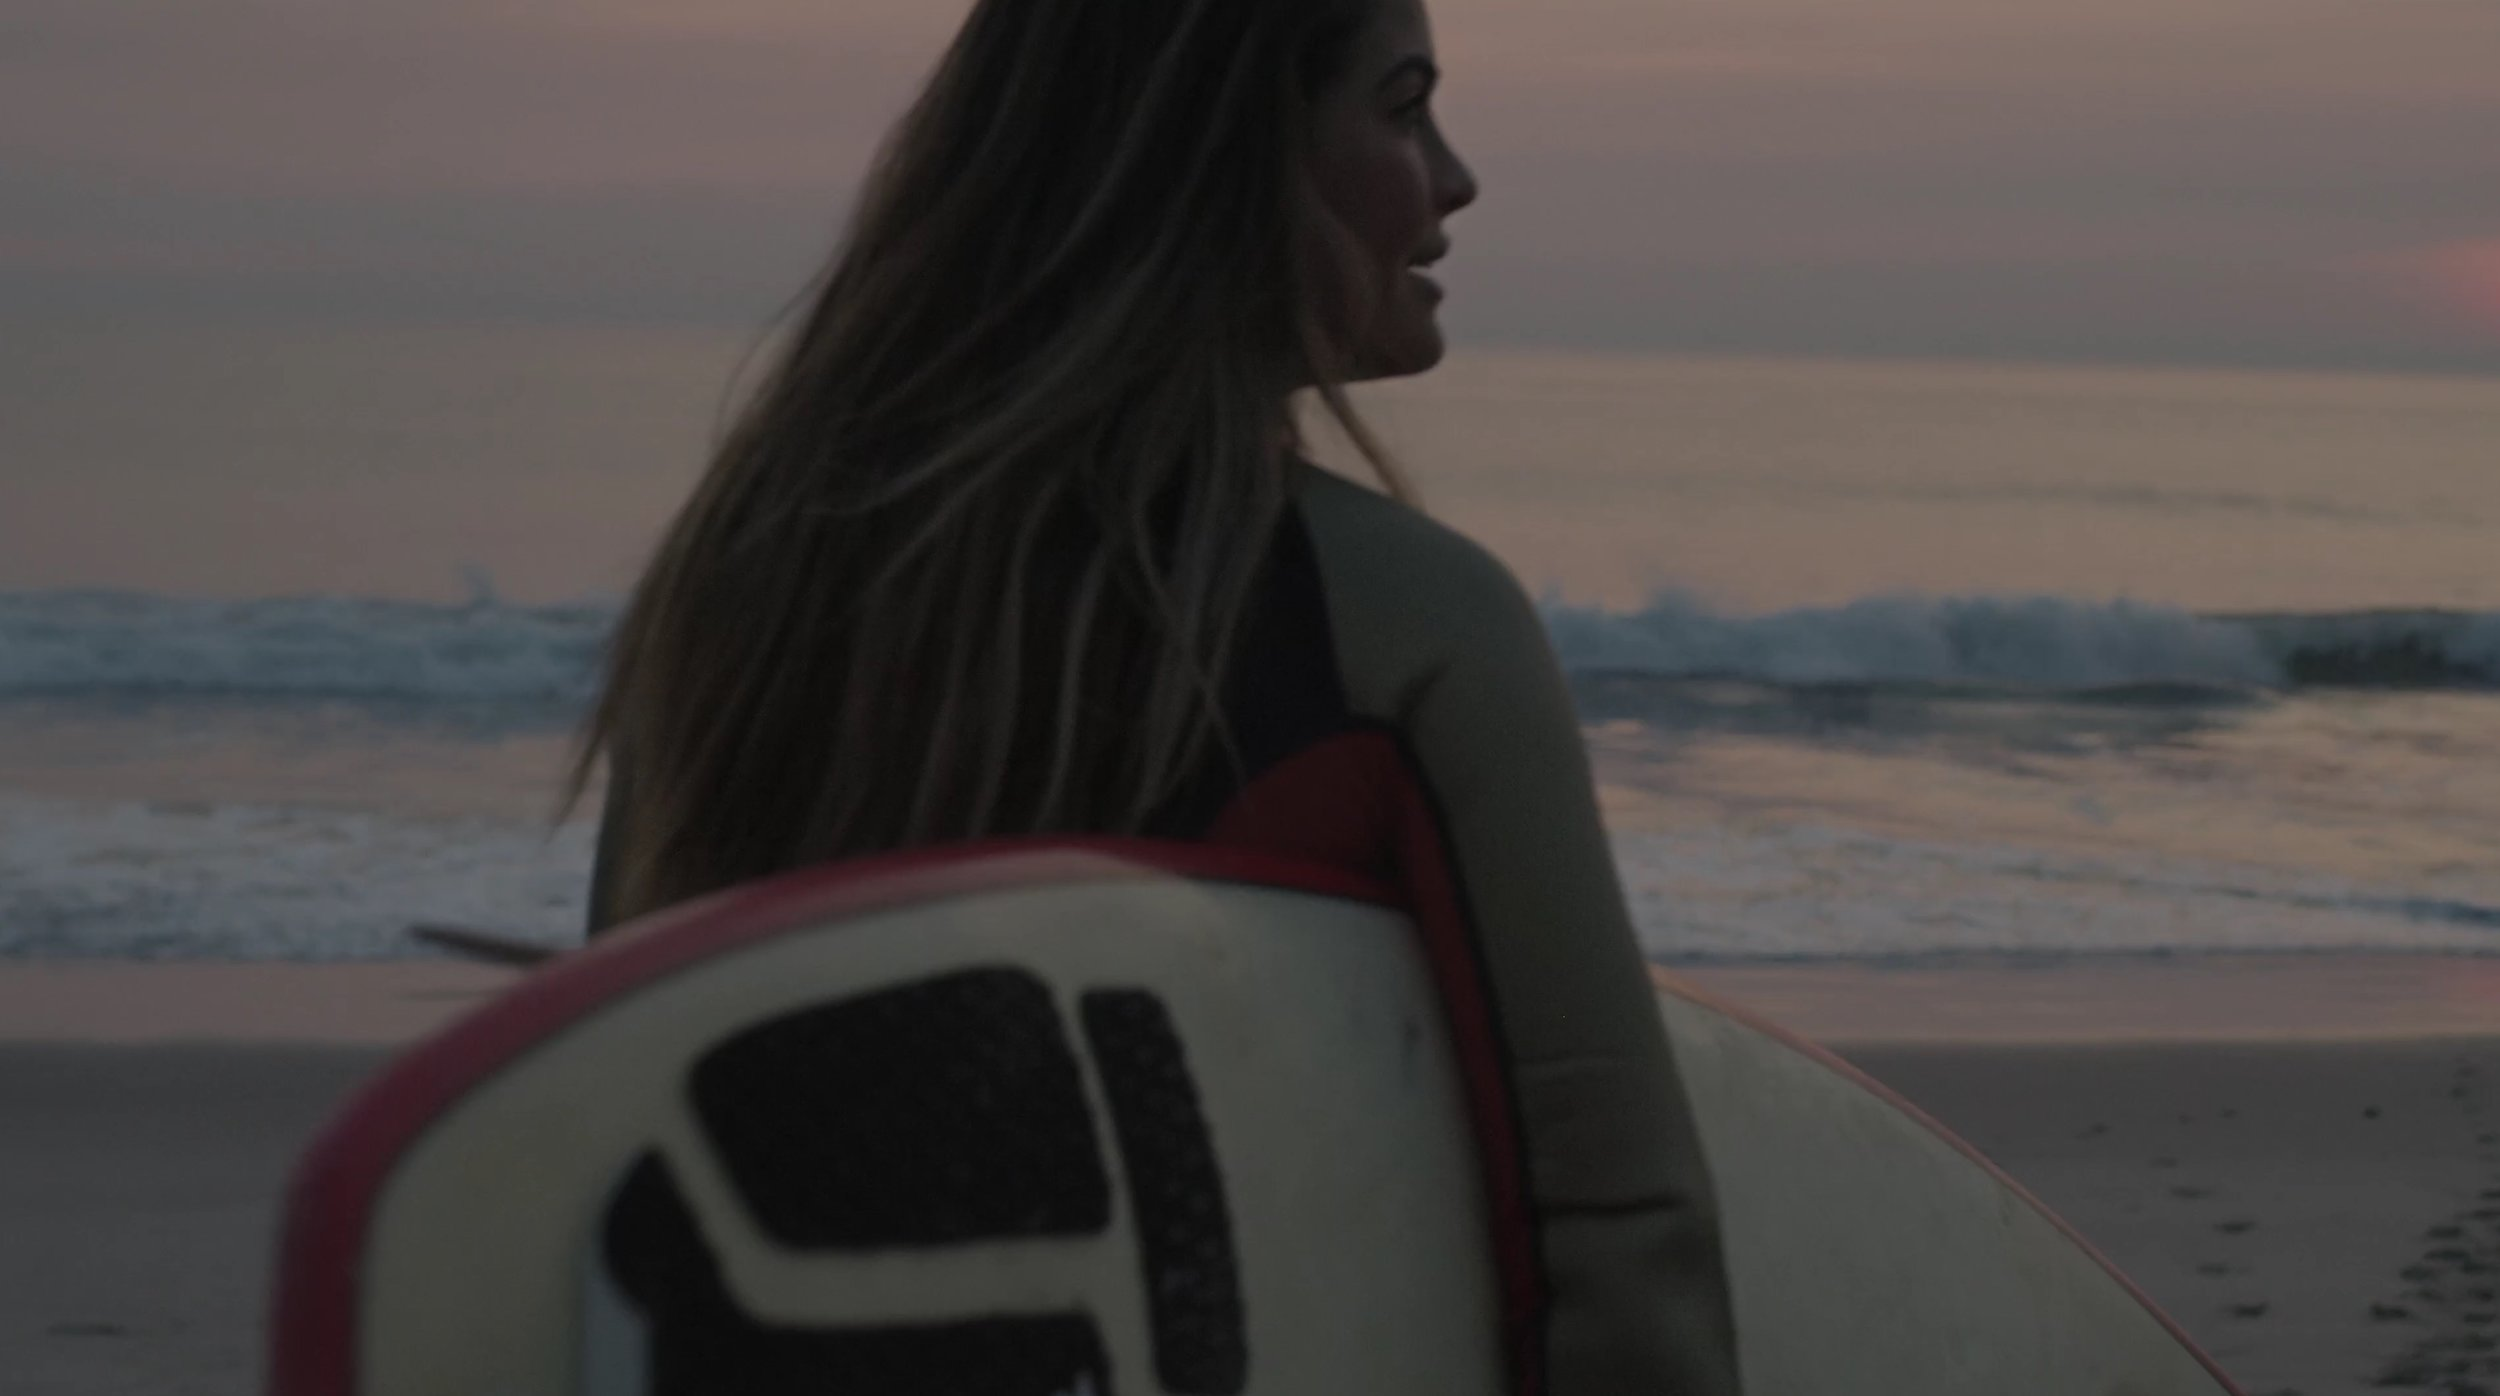 Scene from Kia Rio Launchfilm - shot in Malibu, California